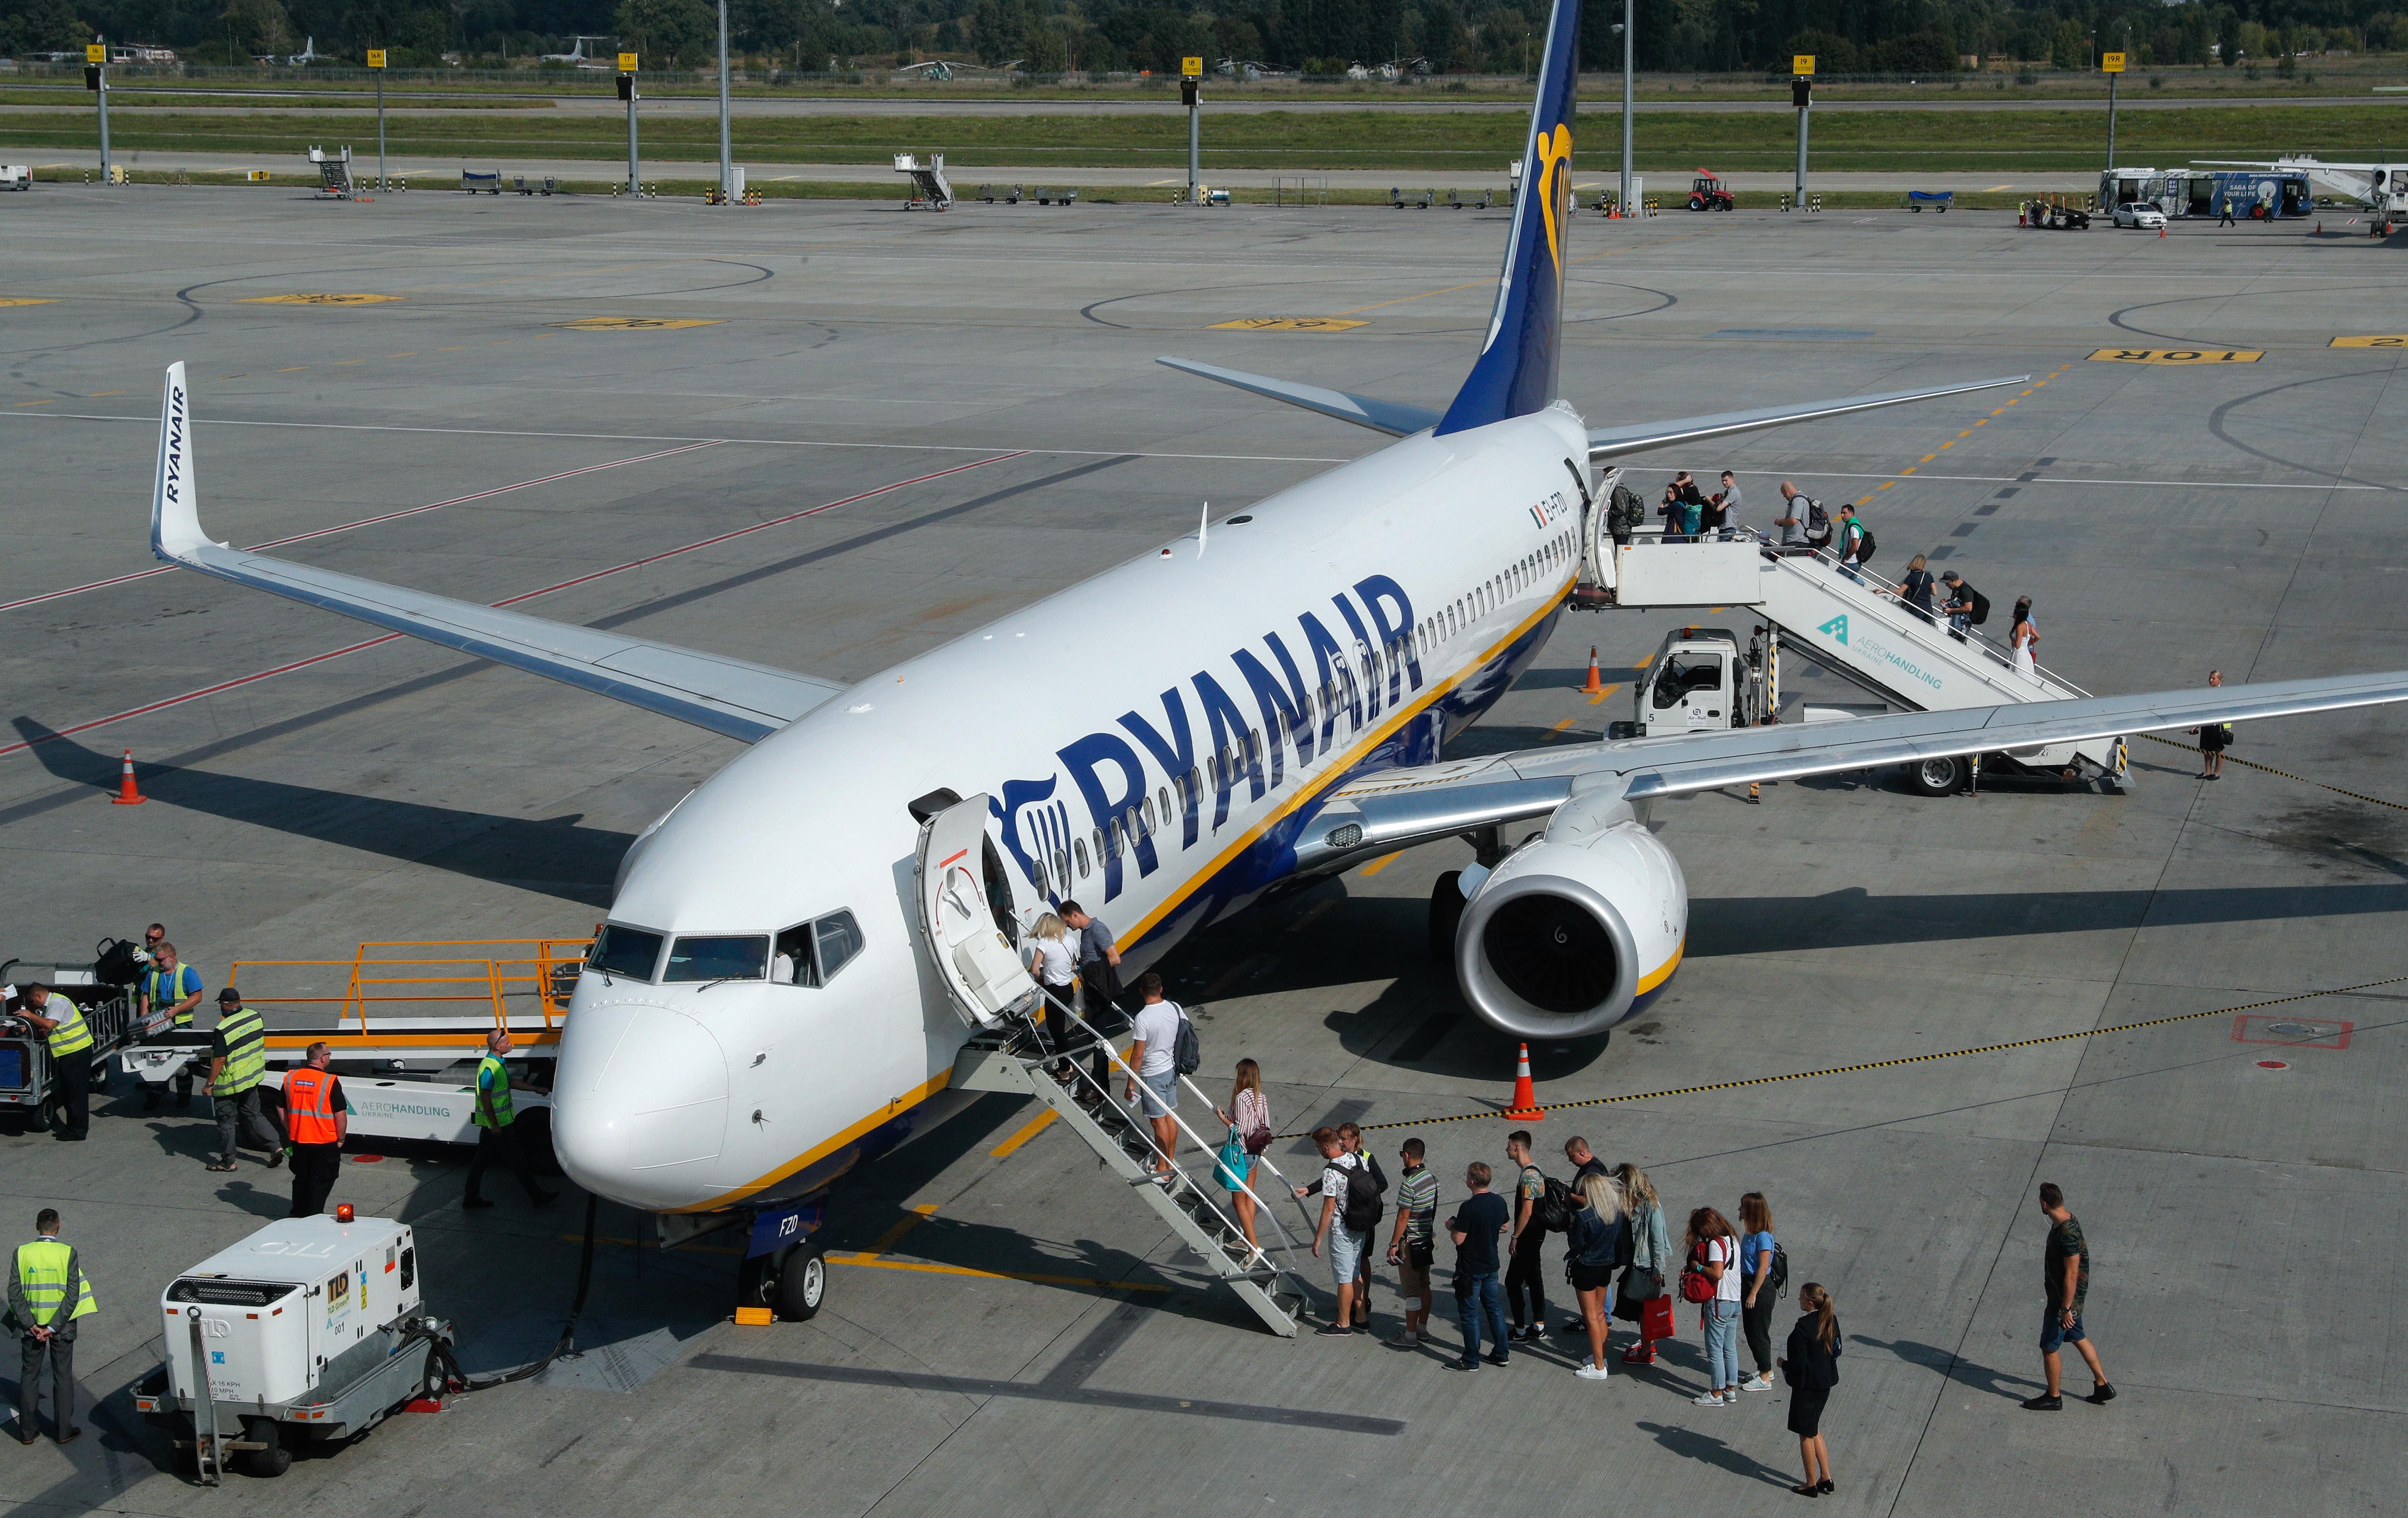 Tribunal condenou Ryanair a indemnizar passageiros afetados por greves